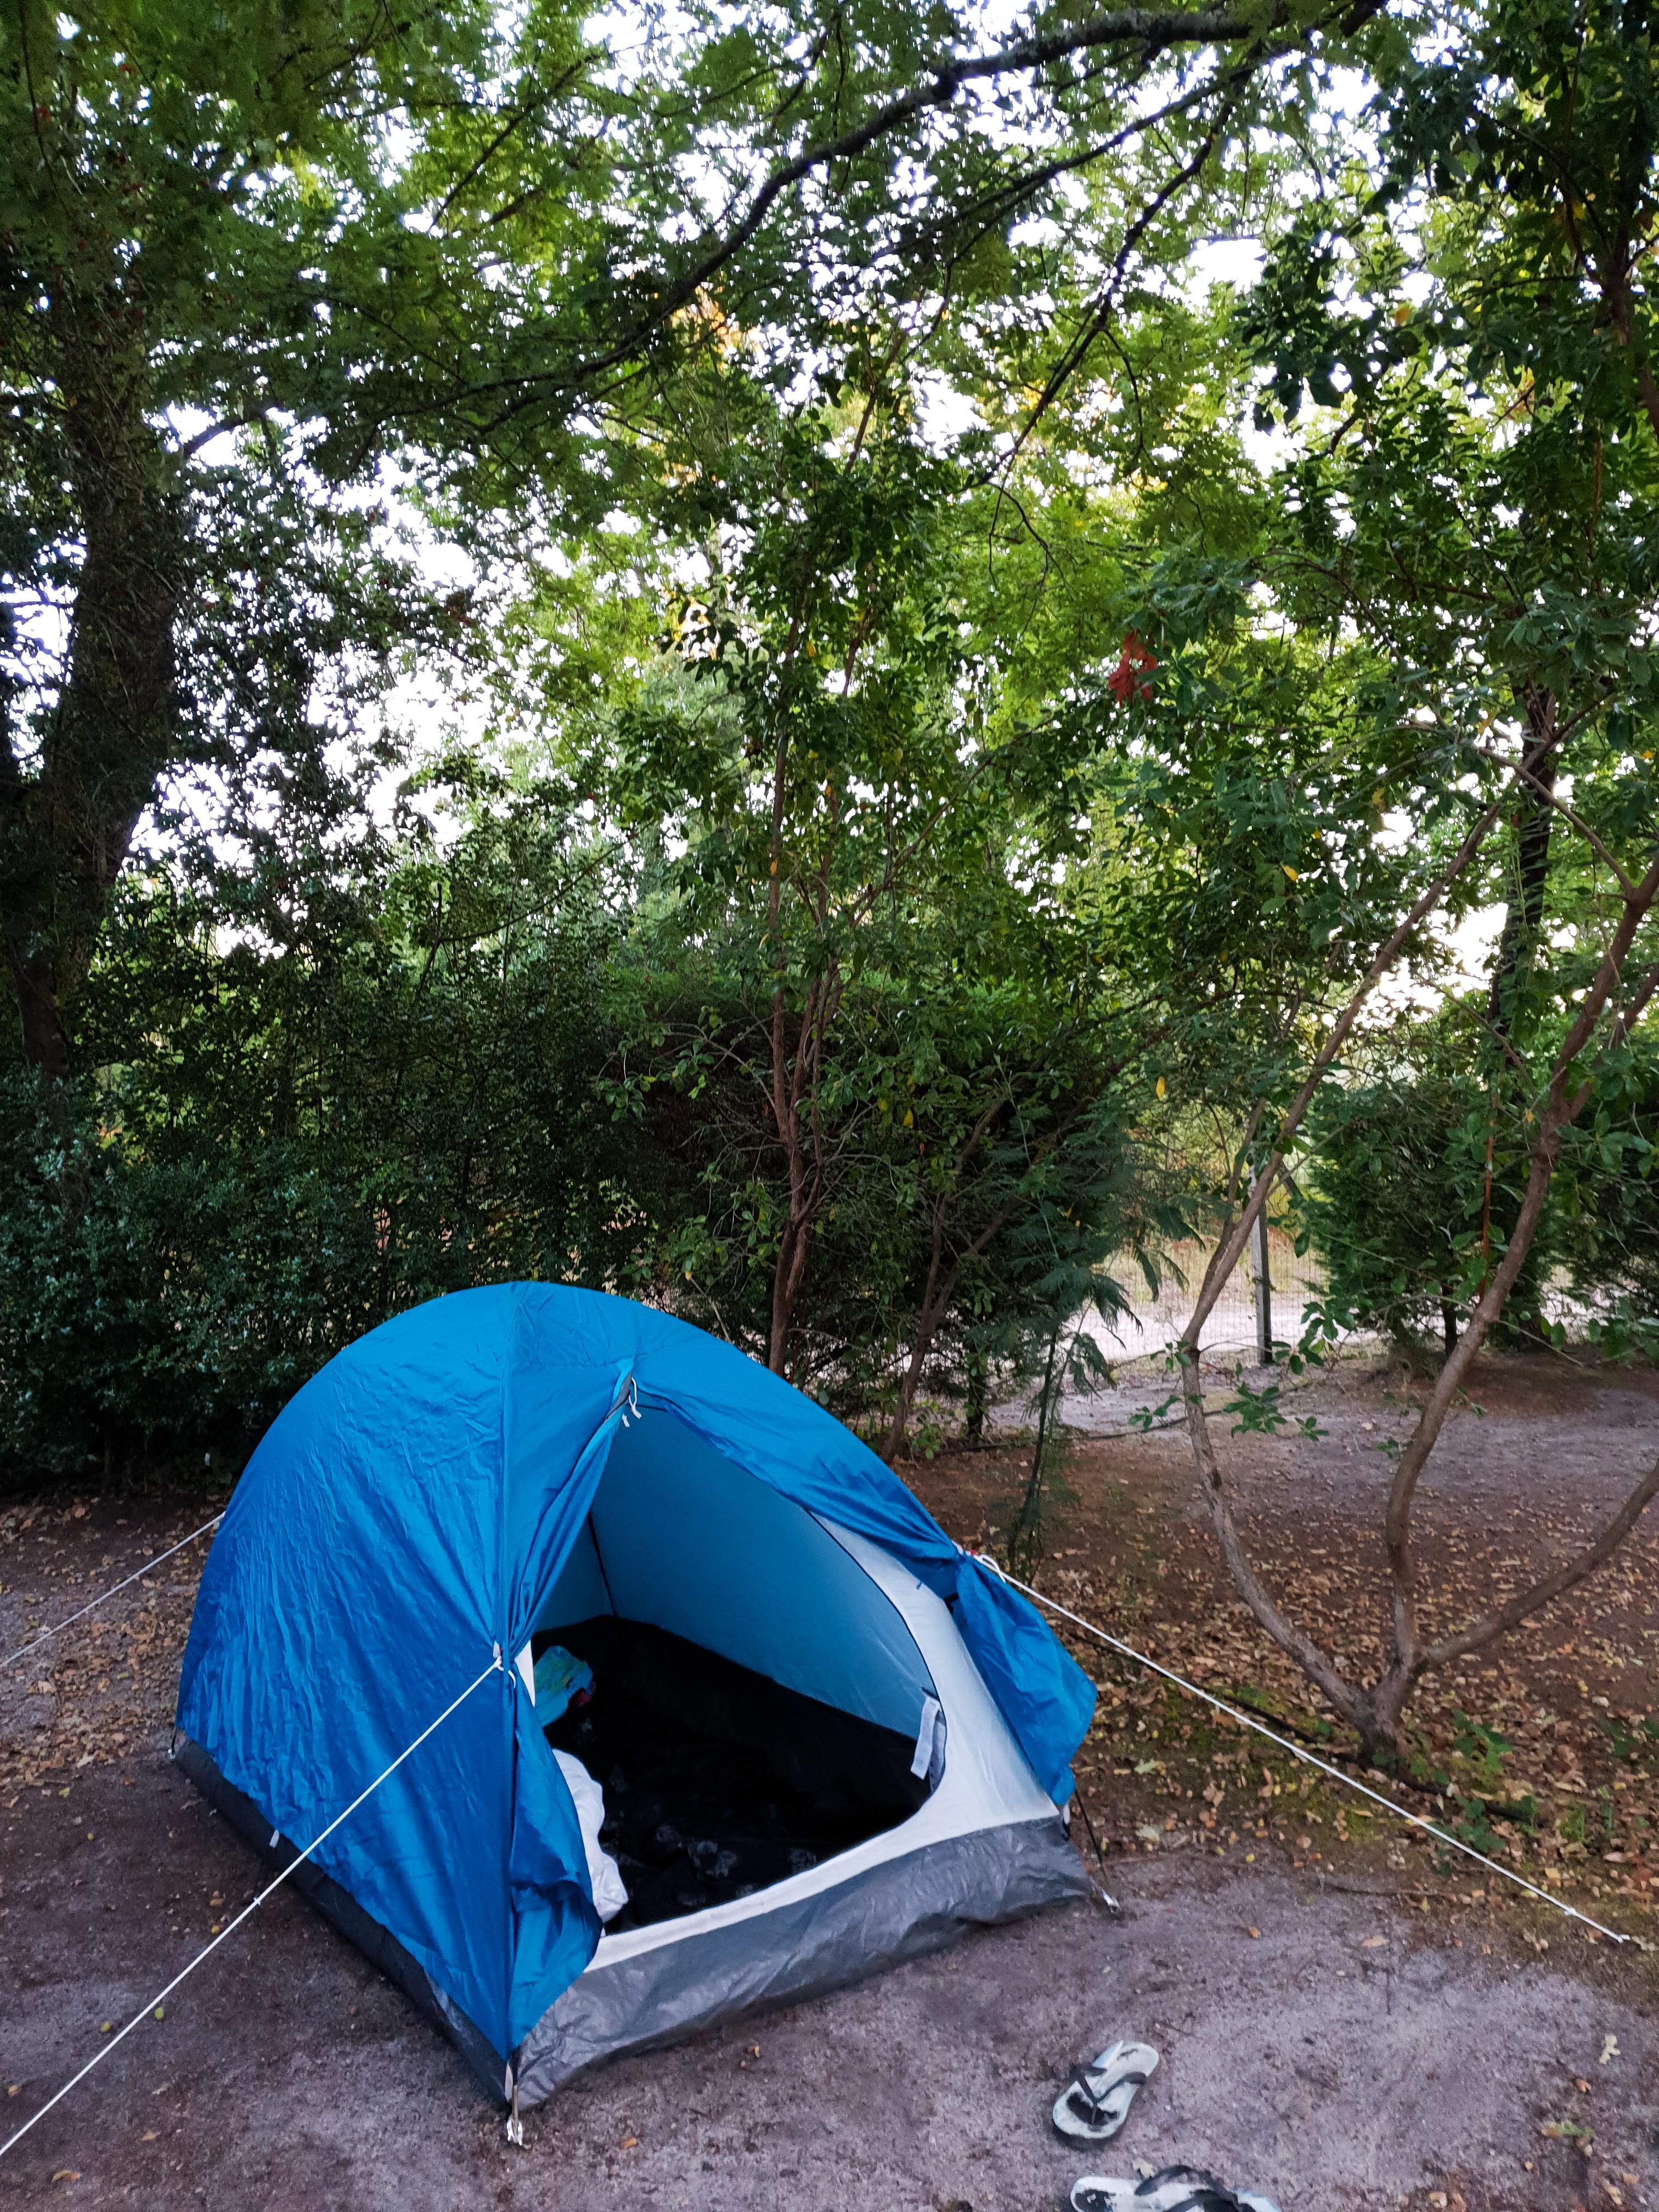 Bassin d'Arcachon - Campement - Nos aventures voyageuses